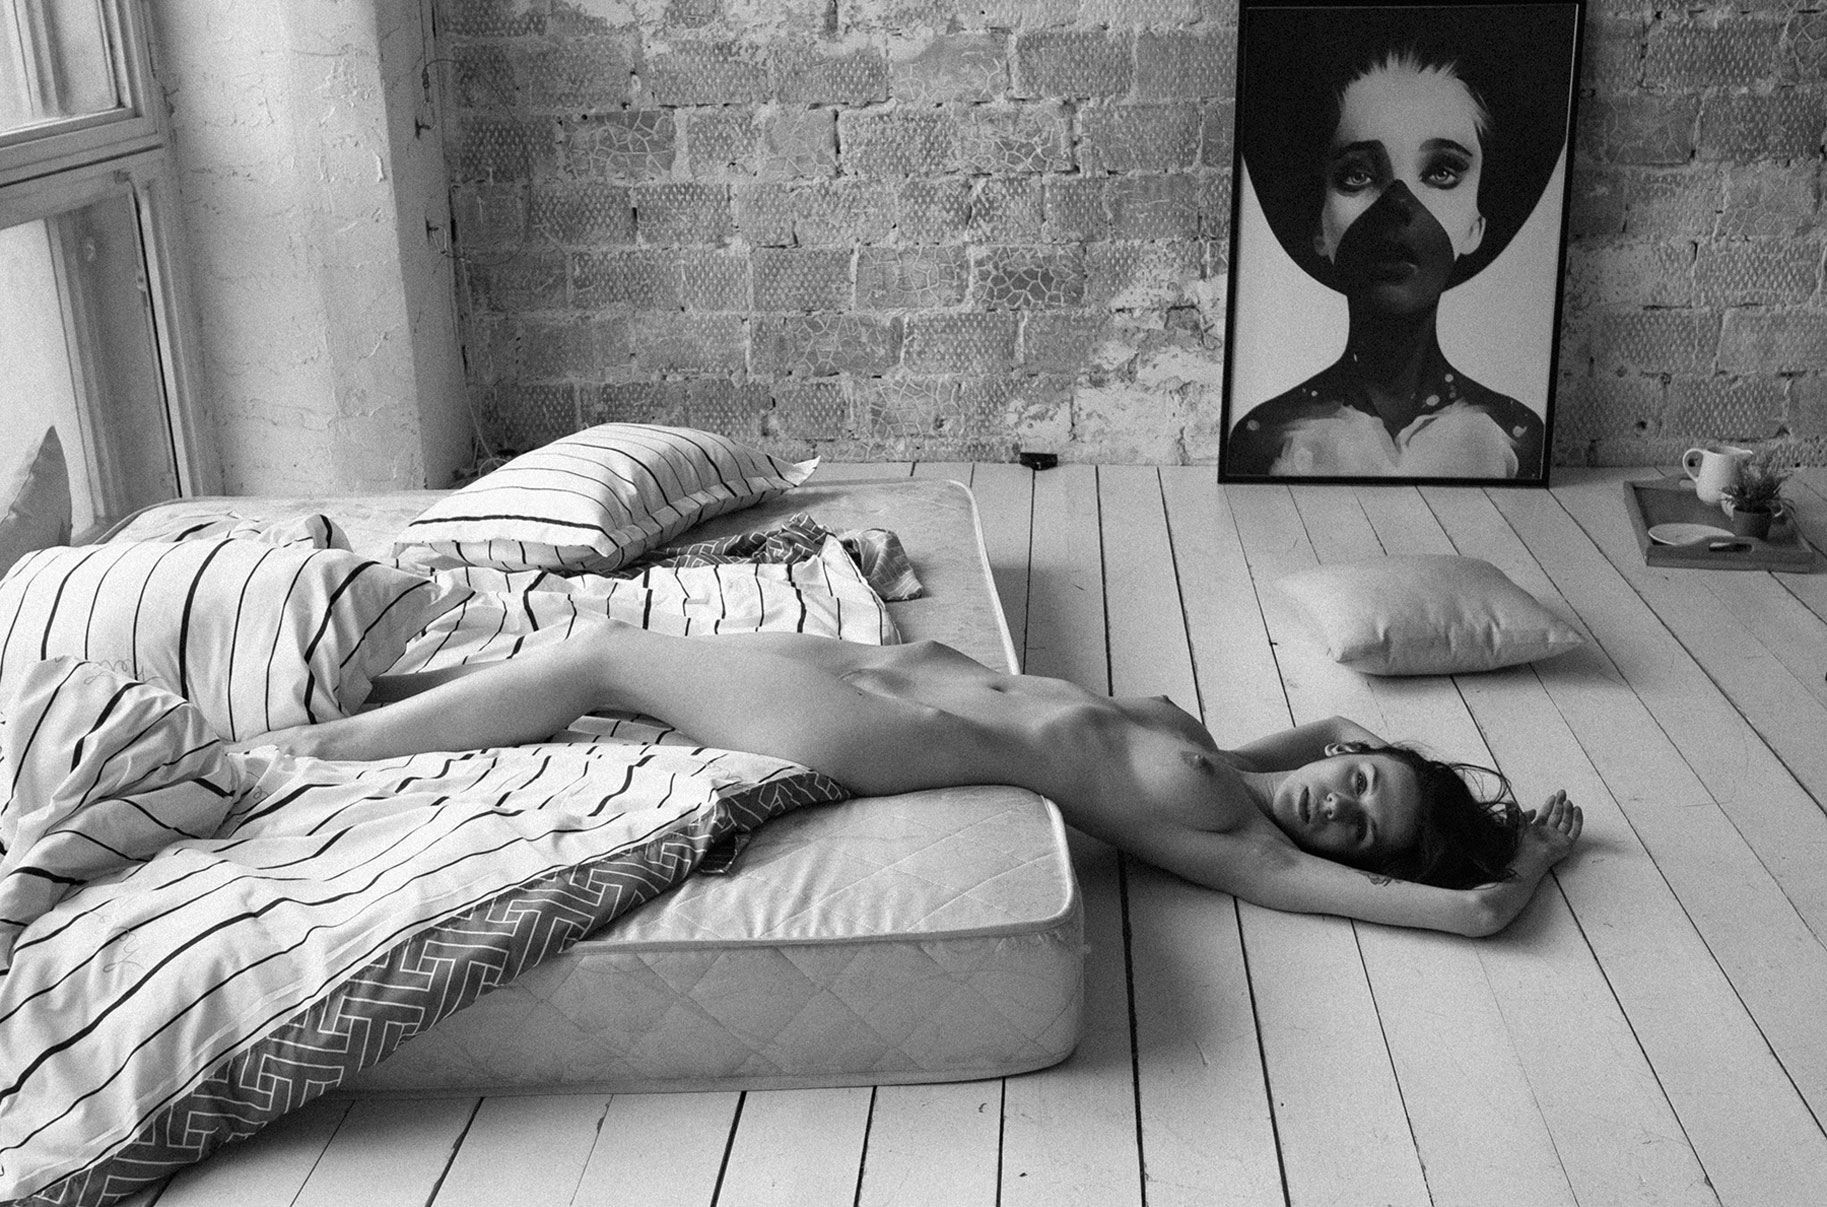 Eva Chekhova nude by Alexey Trifonov